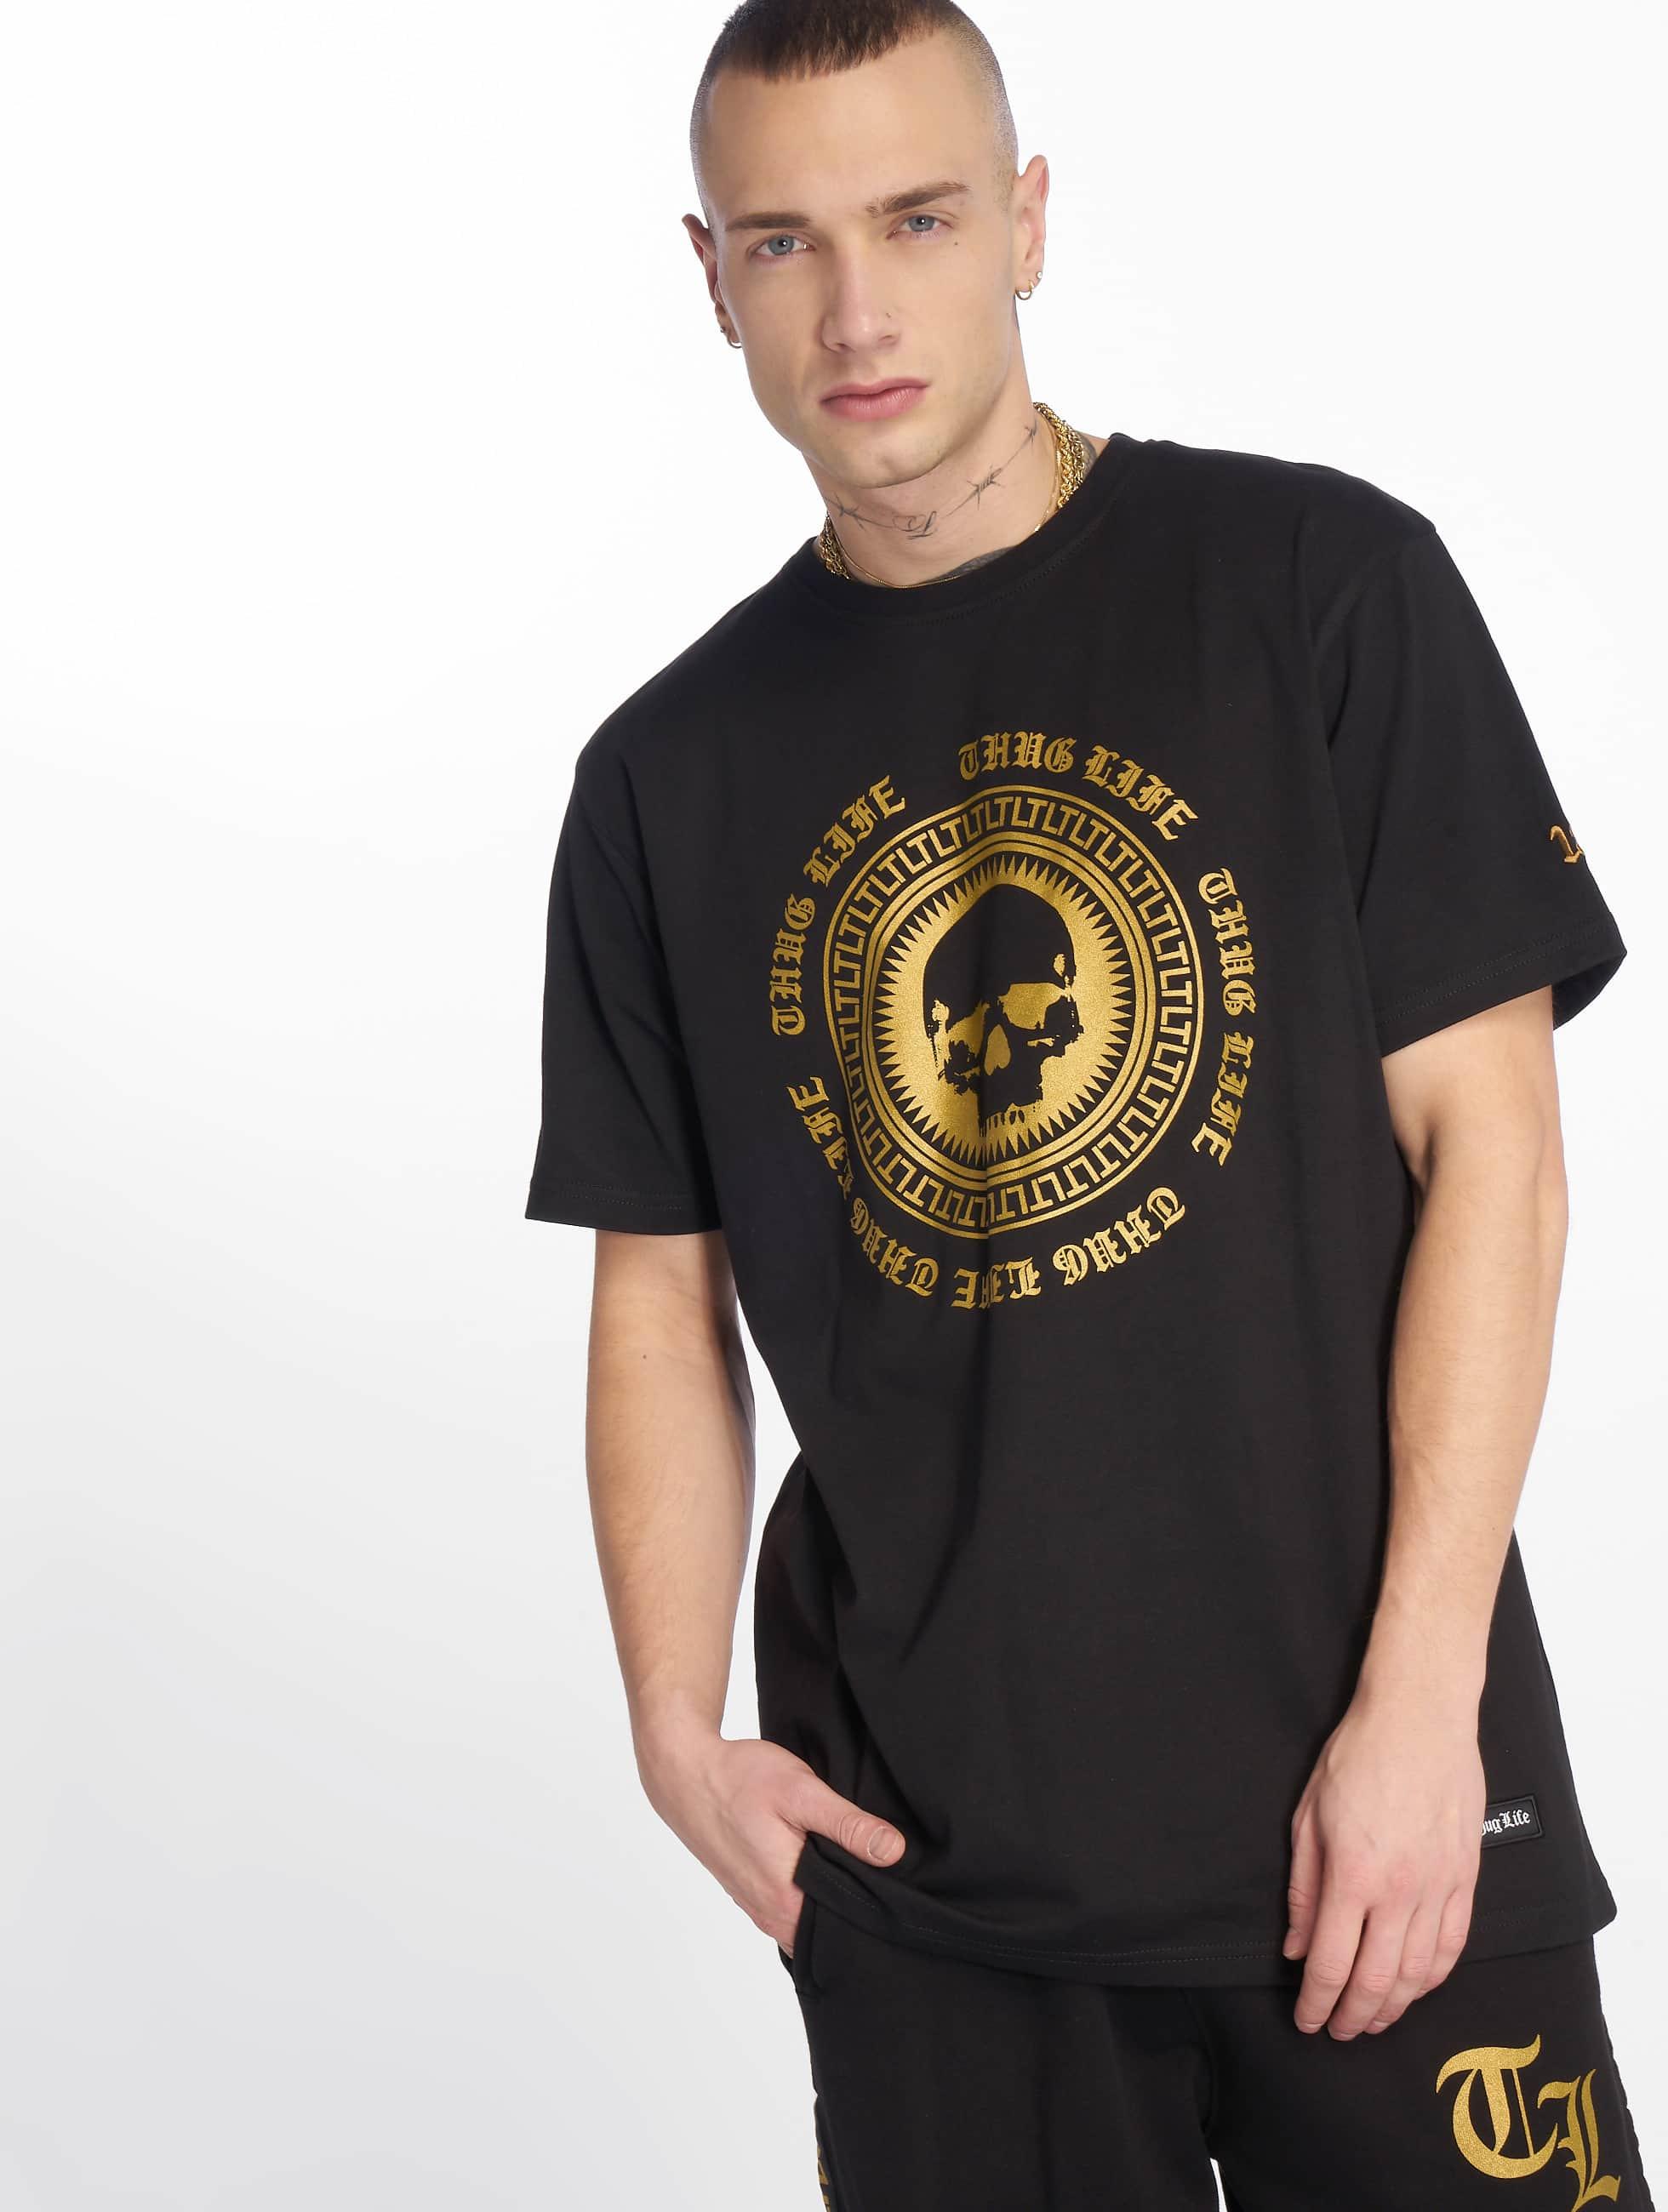 Thug Life / T-Shirt Olli in black S